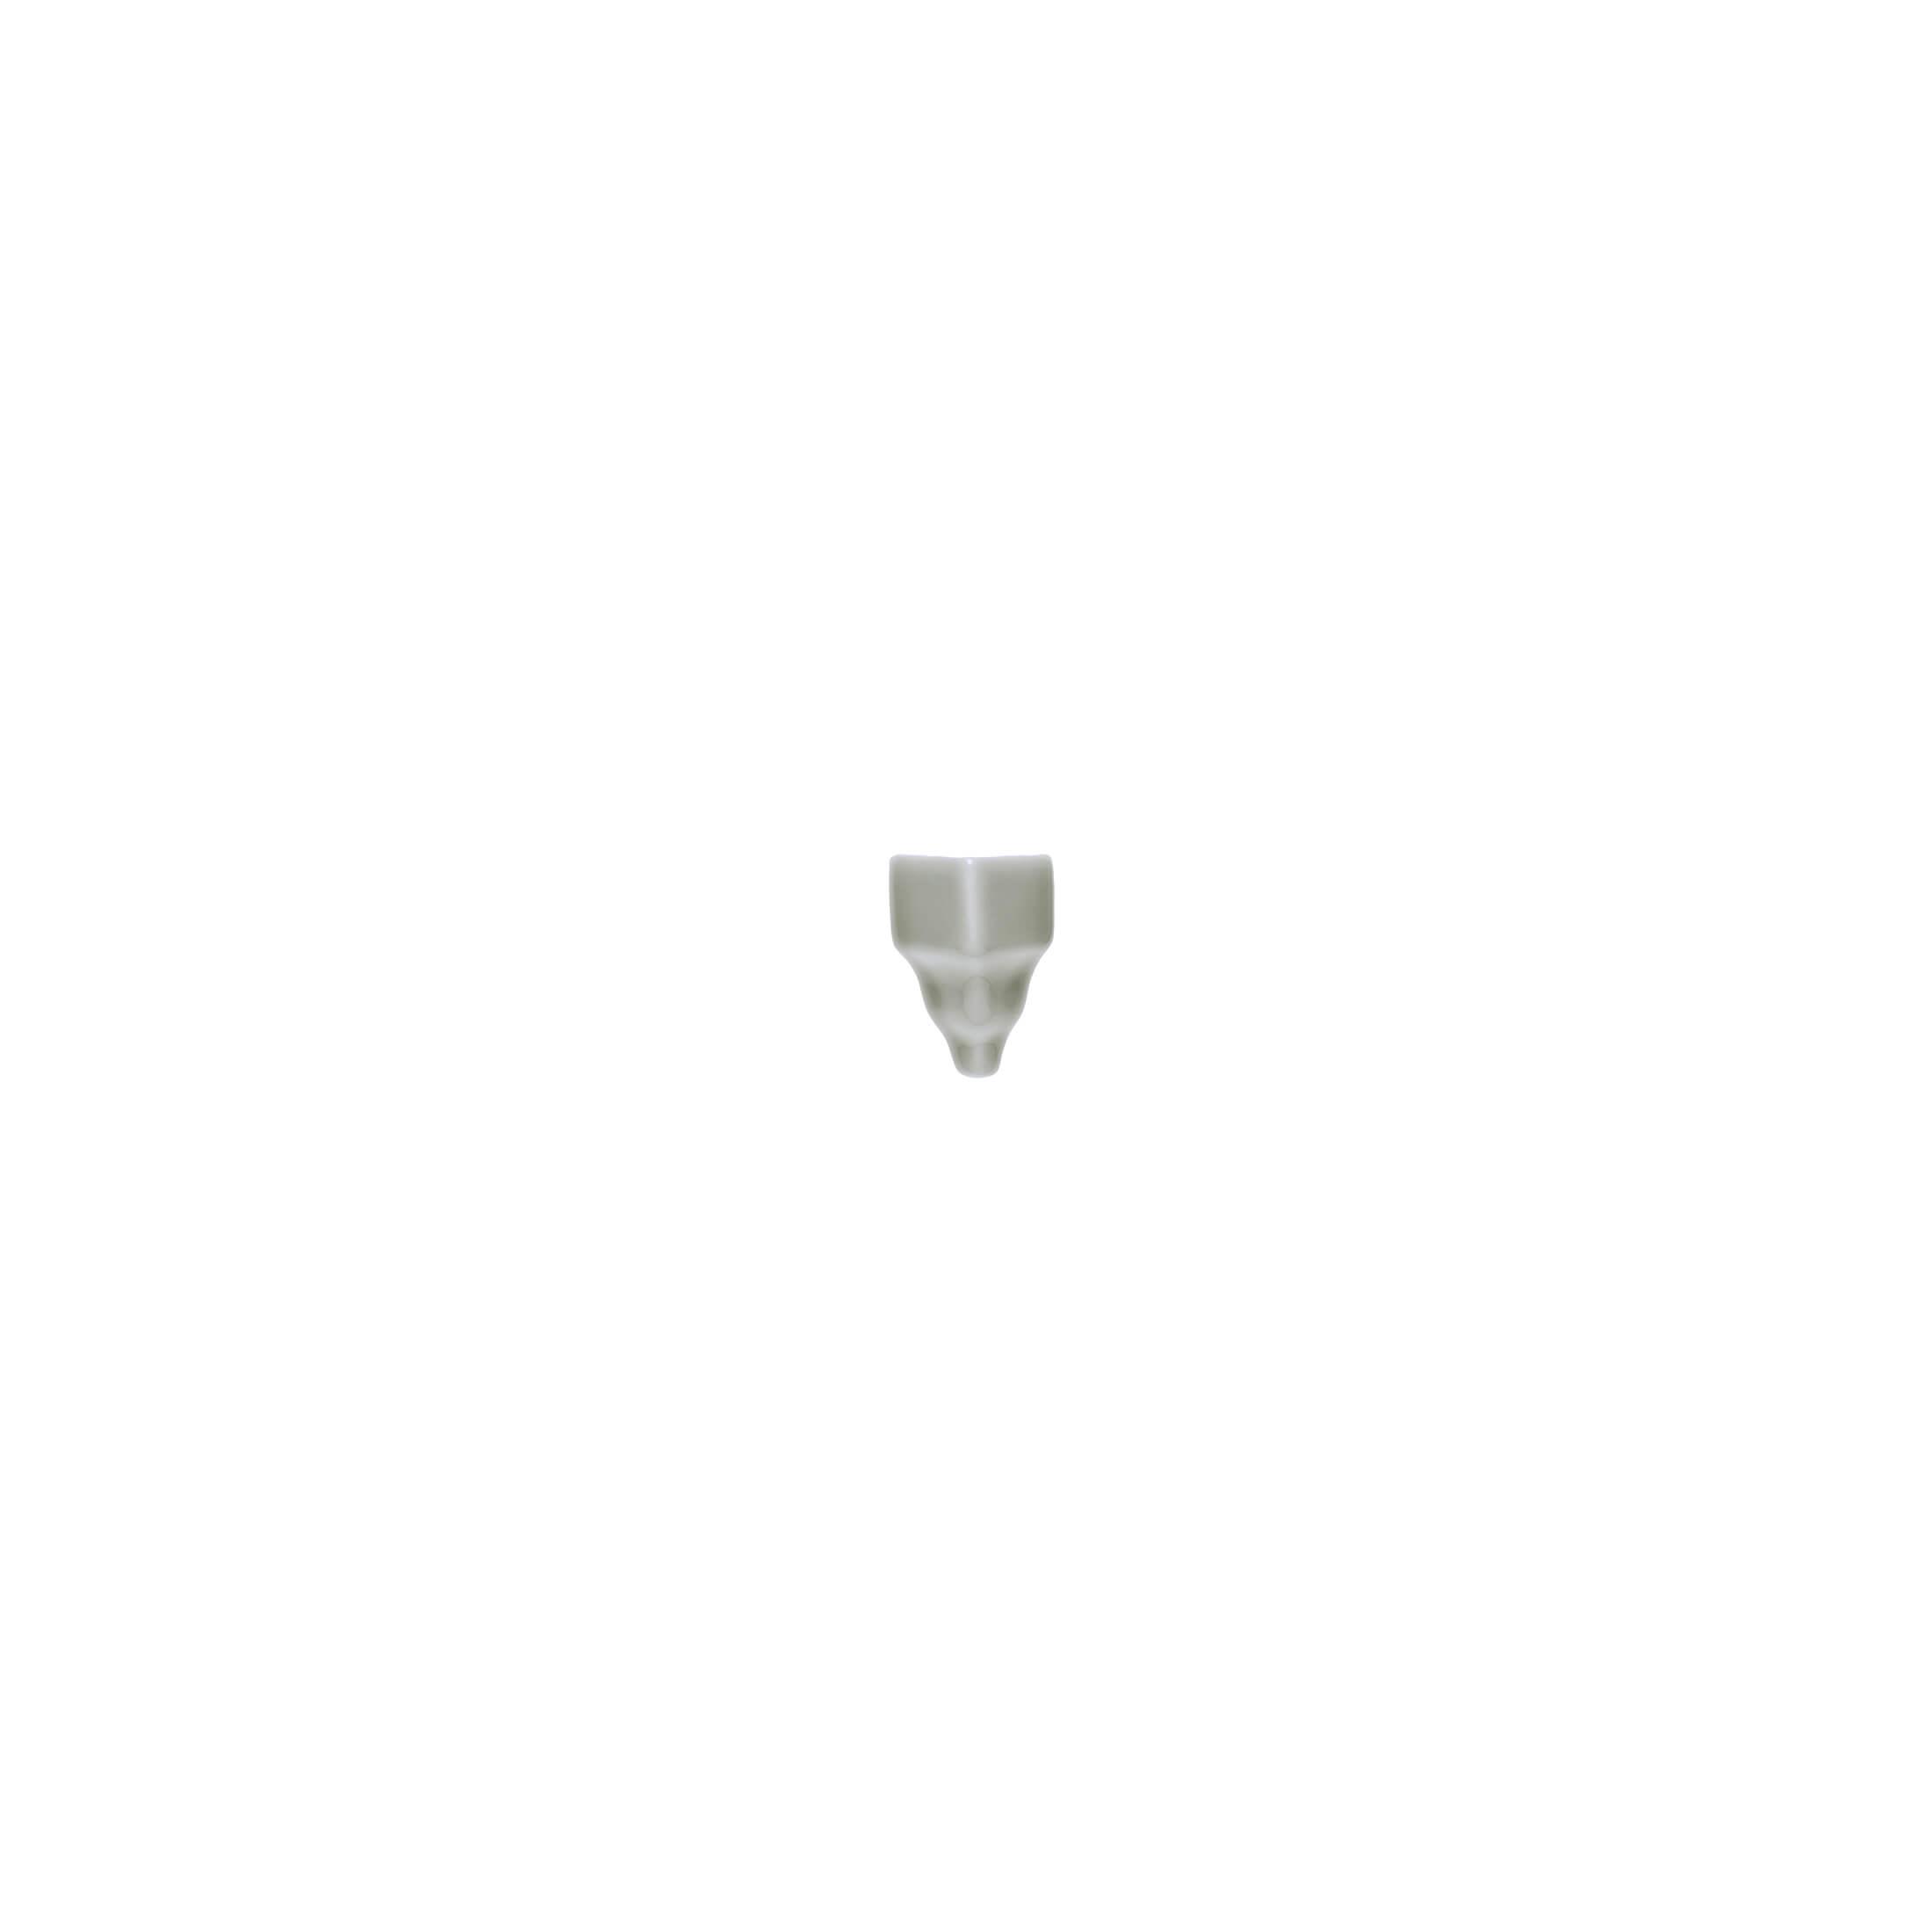 ADNE5506 - ANGULO EXTERIOR CORNISACLASICA - 3.5 cm X 15 cm